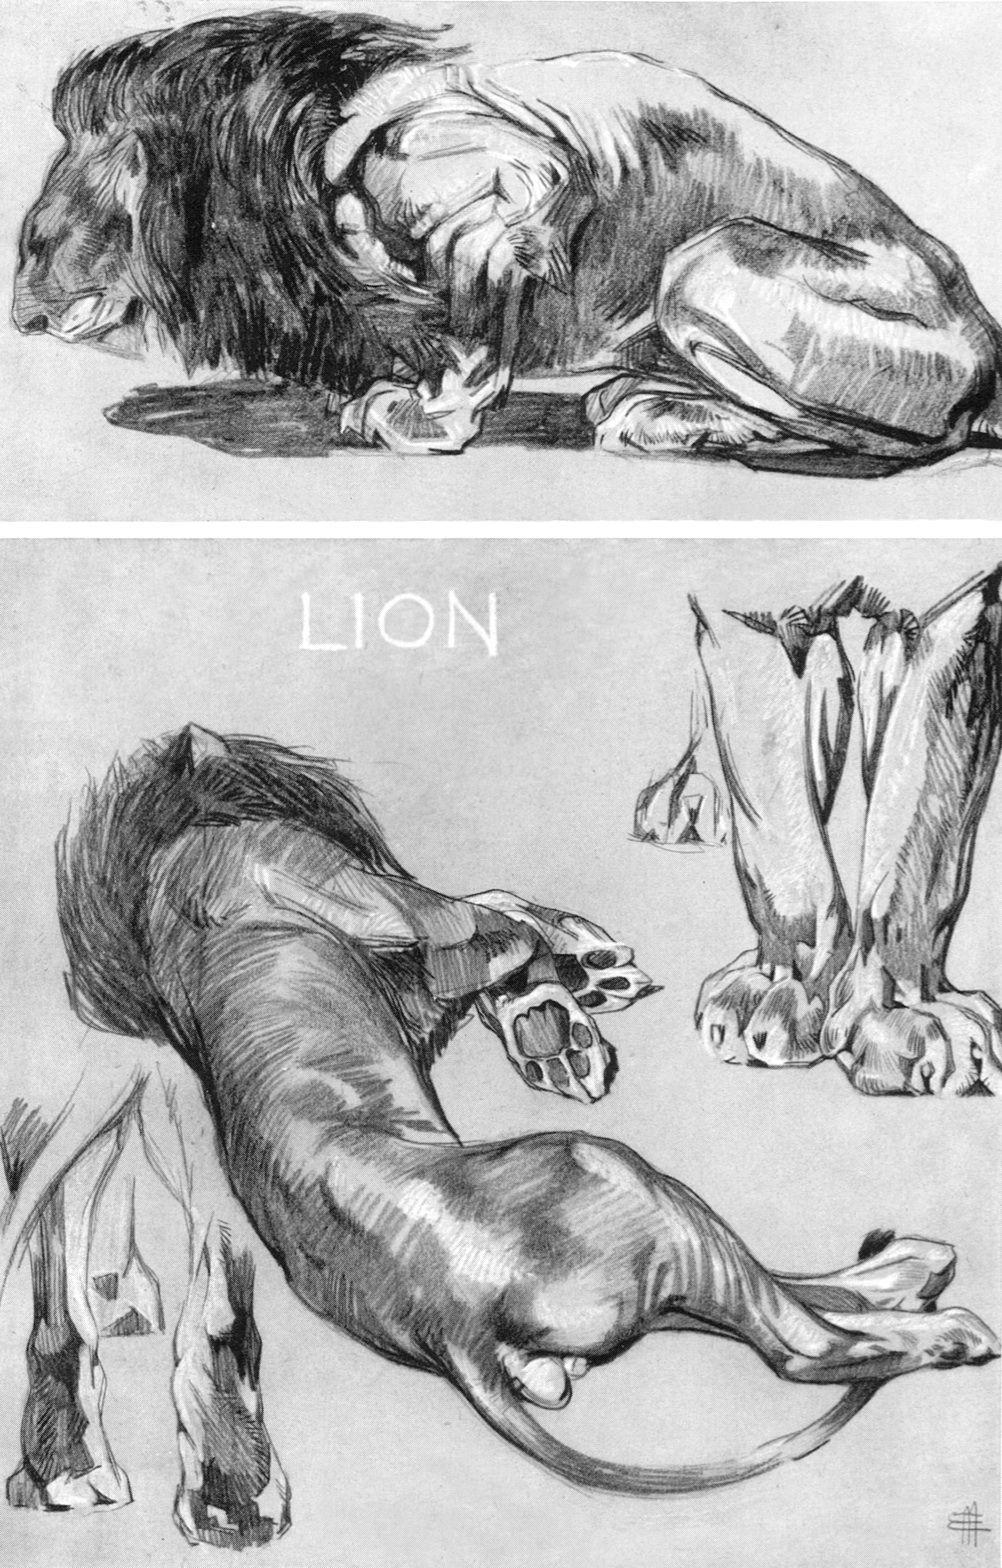 Deja View Mathurin Mheut Art Pinterest Animal Lions And Draw